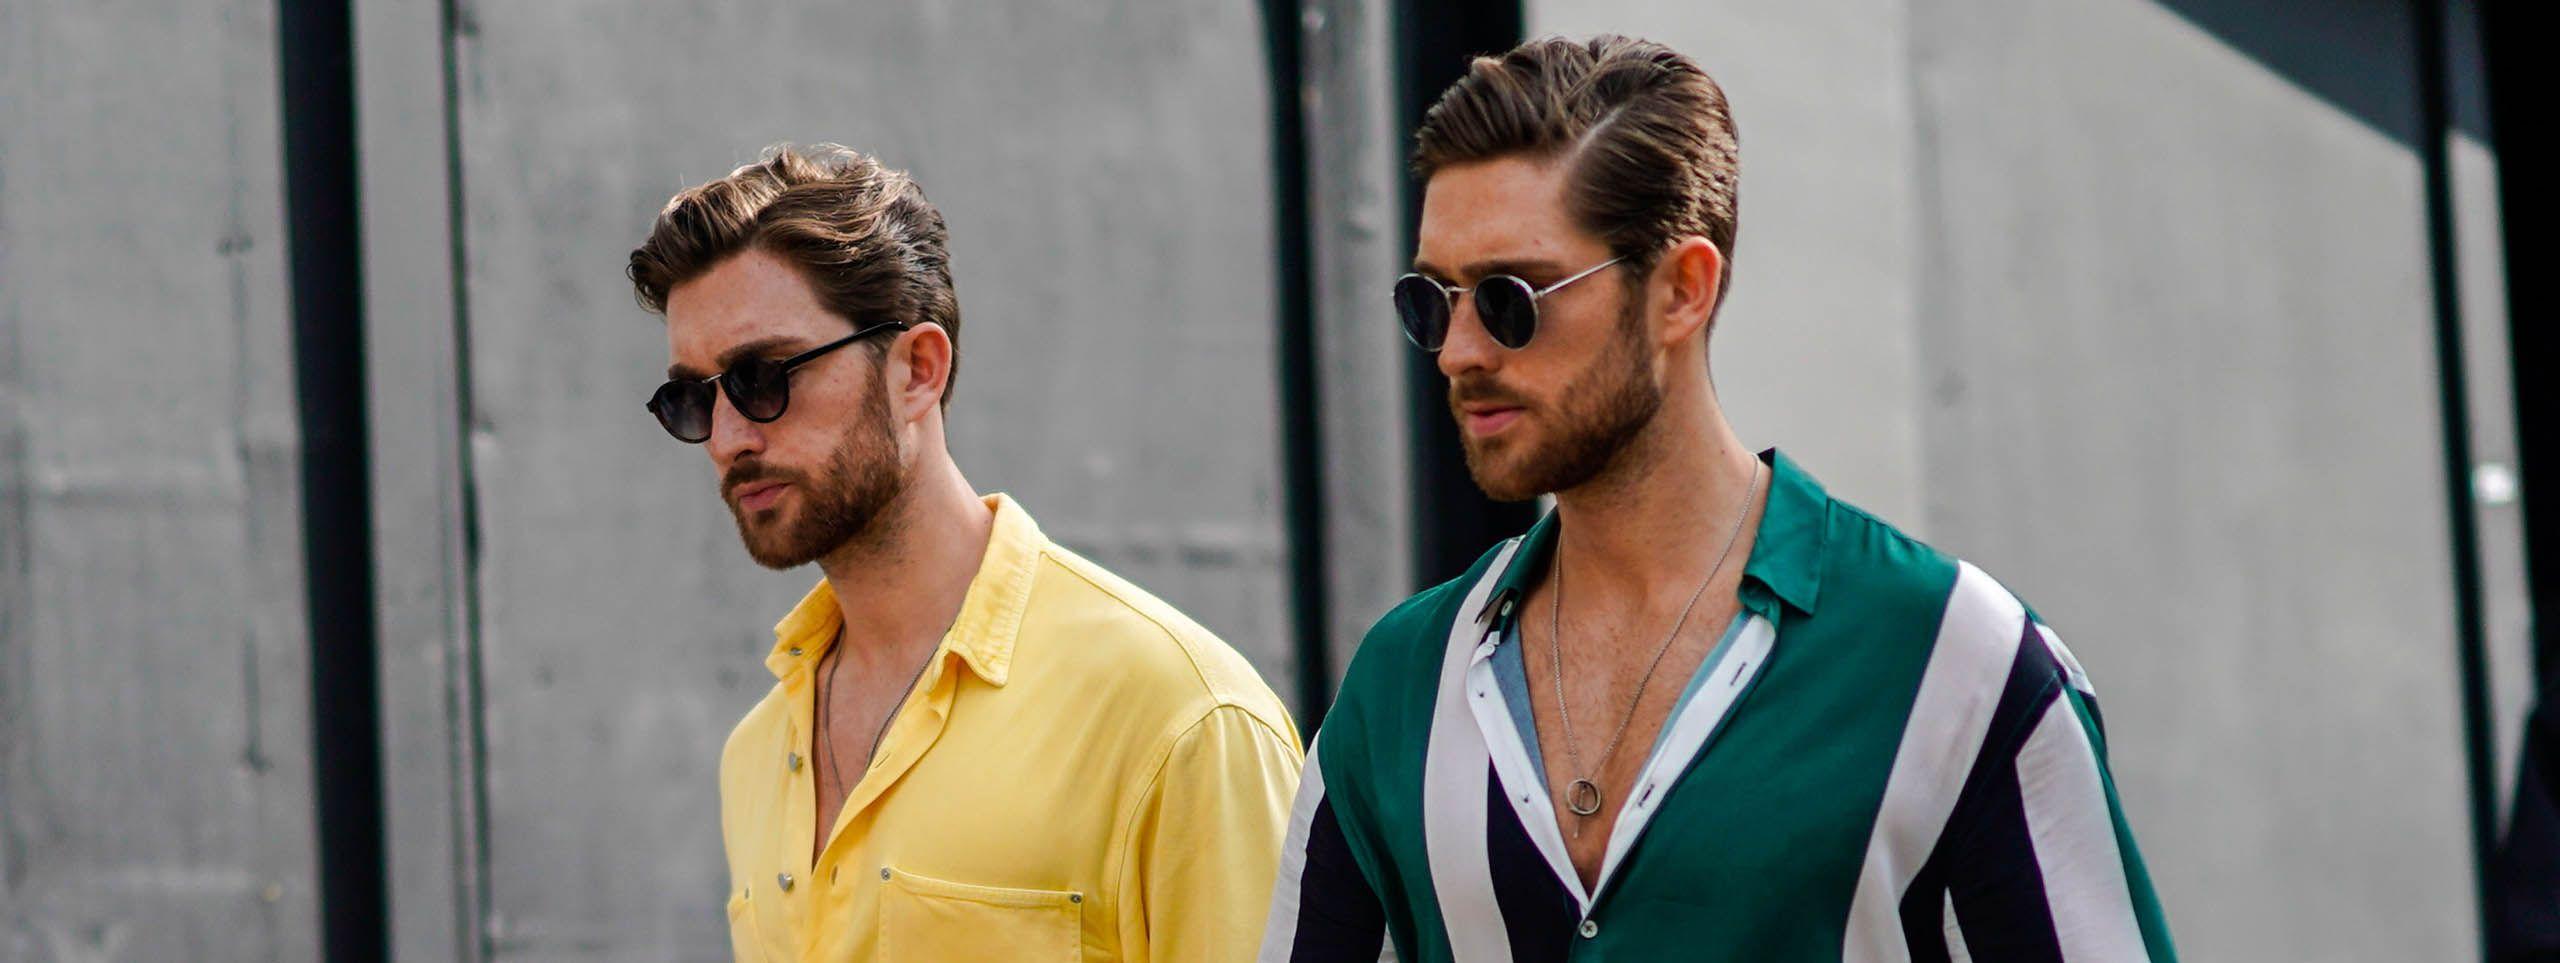 Dva muškarca s kokoticama